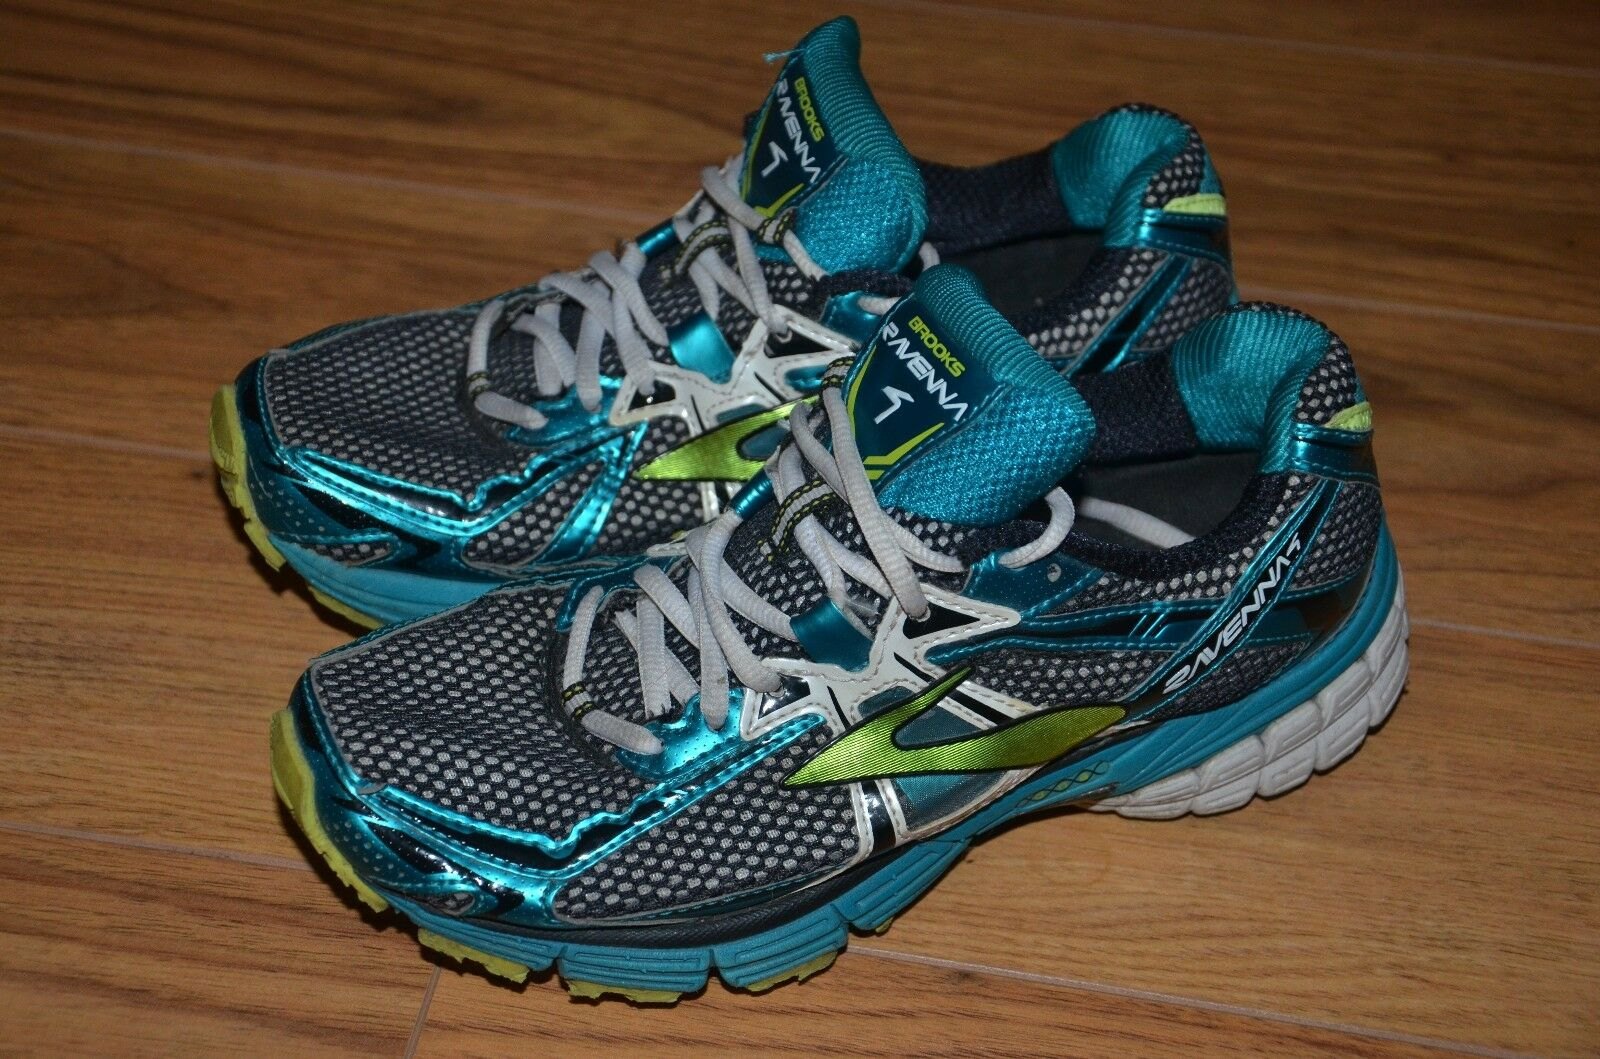 Brooks ravenna 4 womens athletic running shoes size 8 US